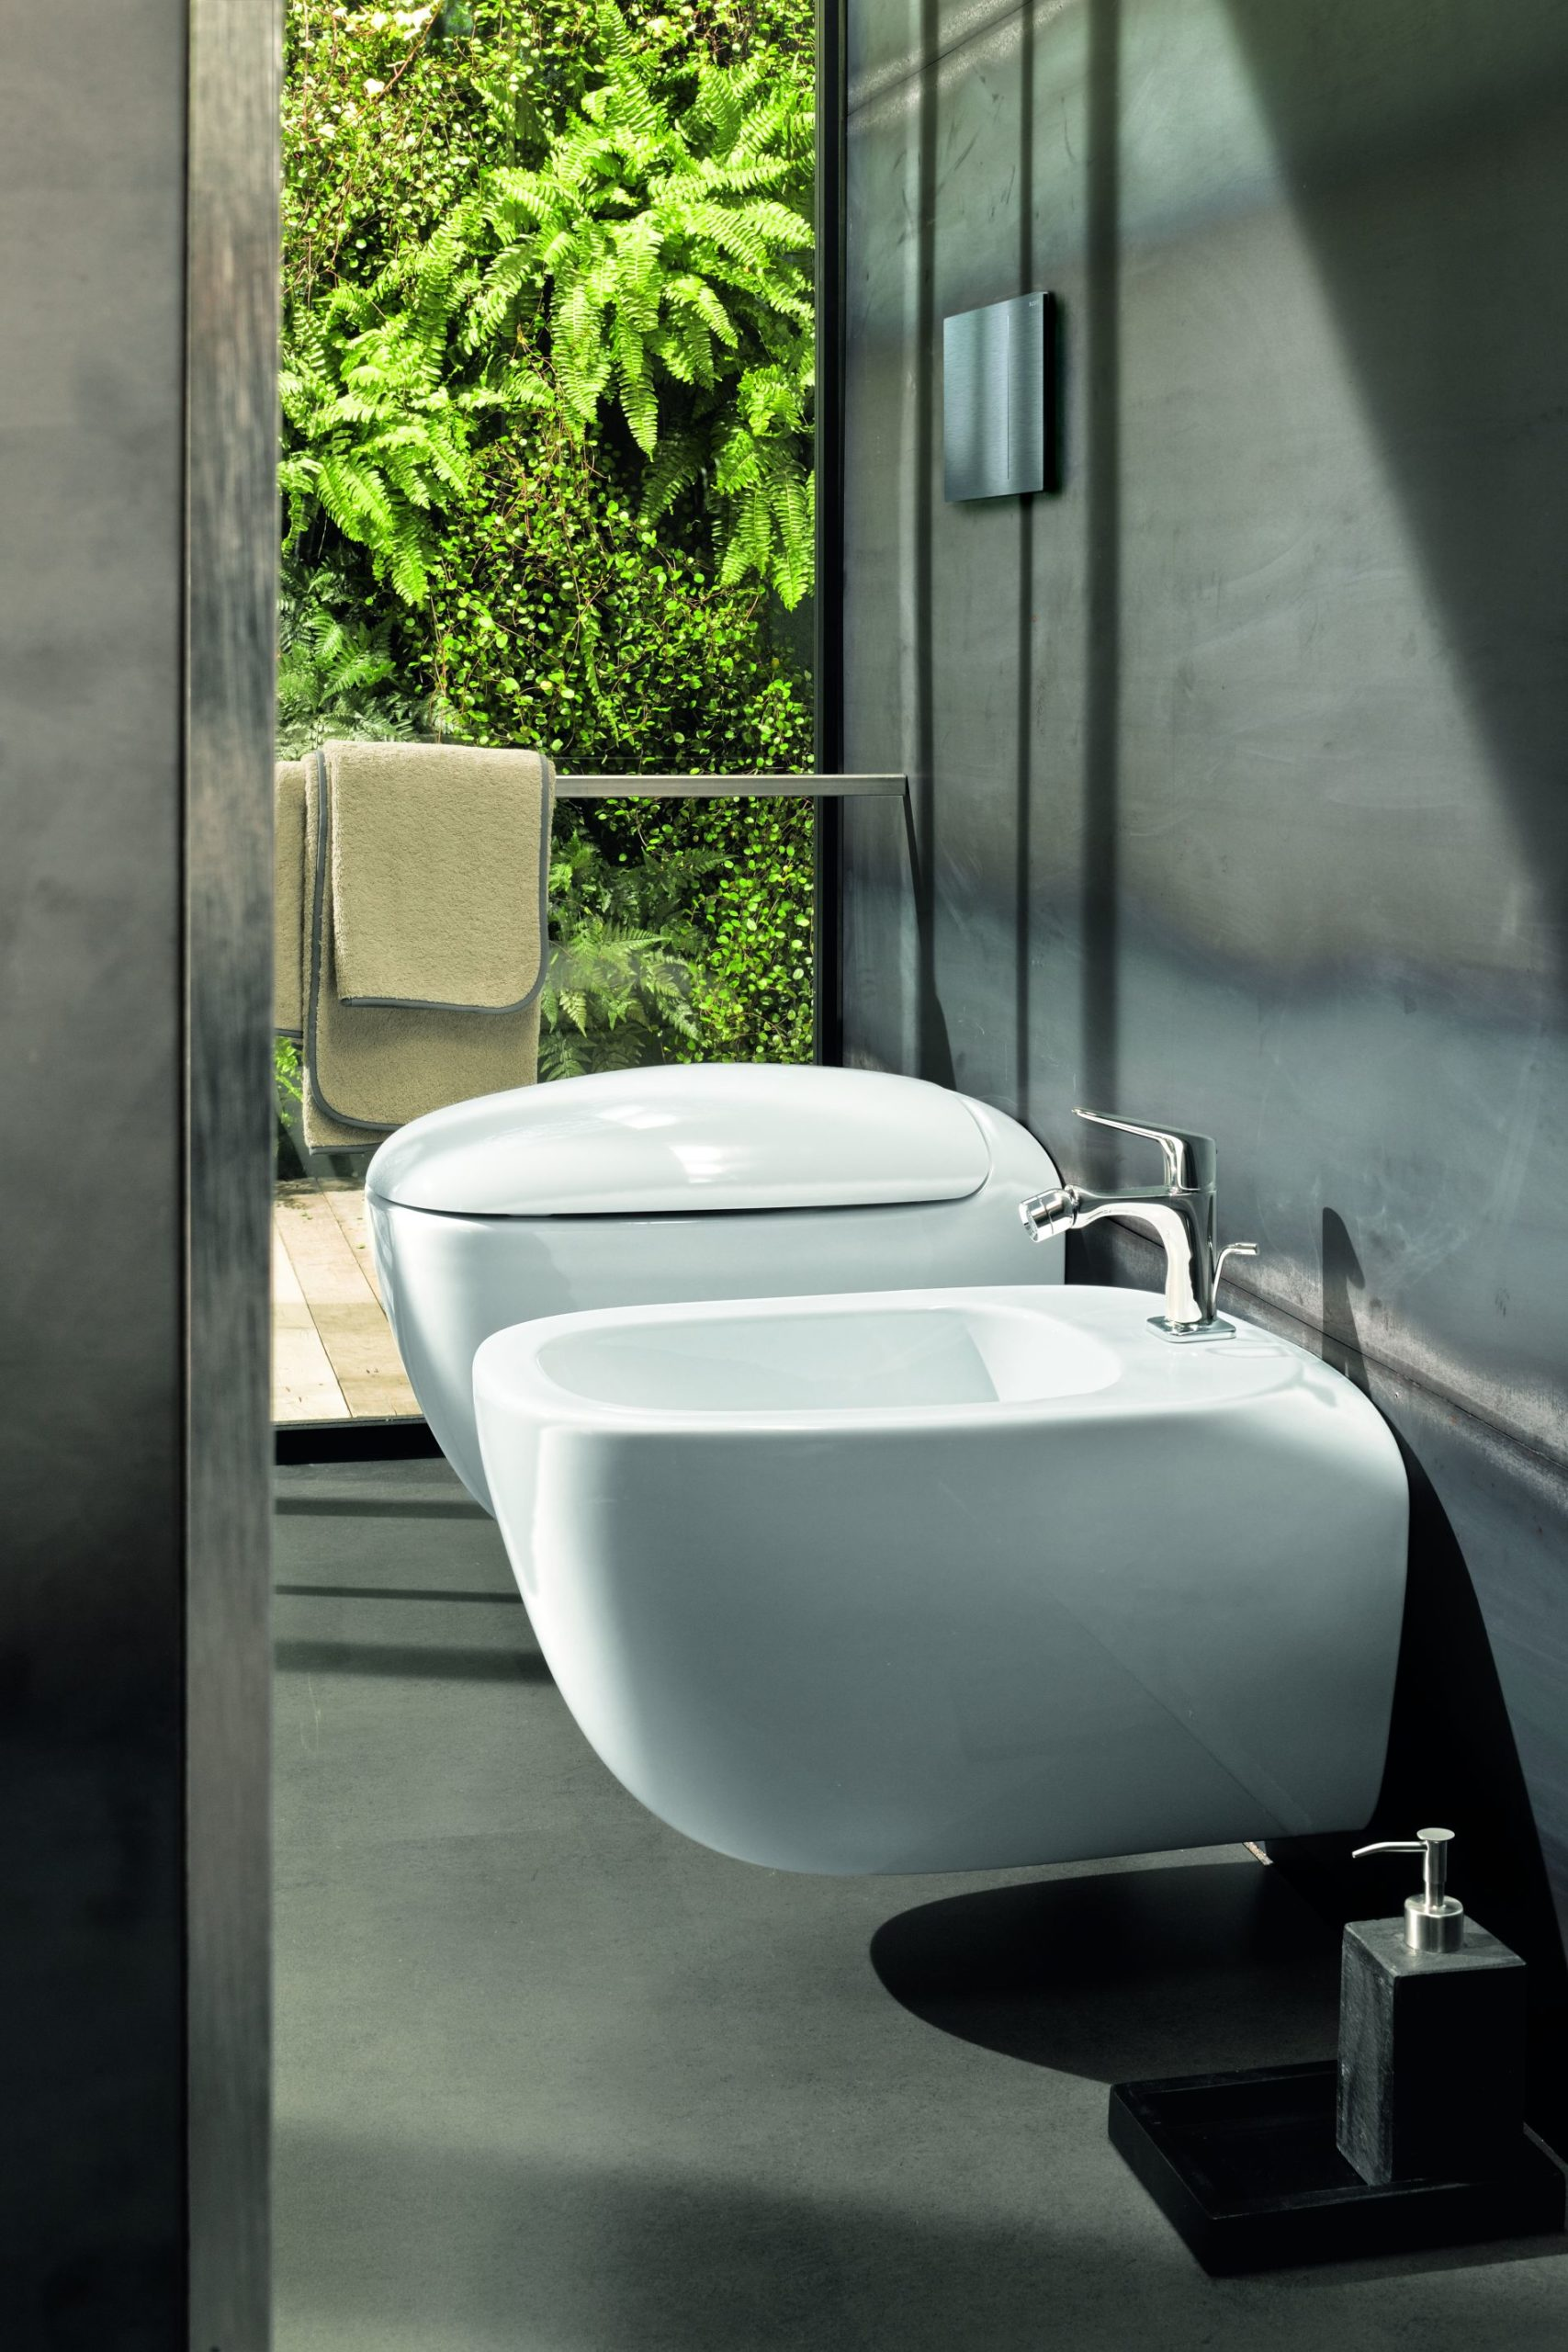 Antonio Citterio miska bidet Geberit ceramika łazienkowa projekt łazienki